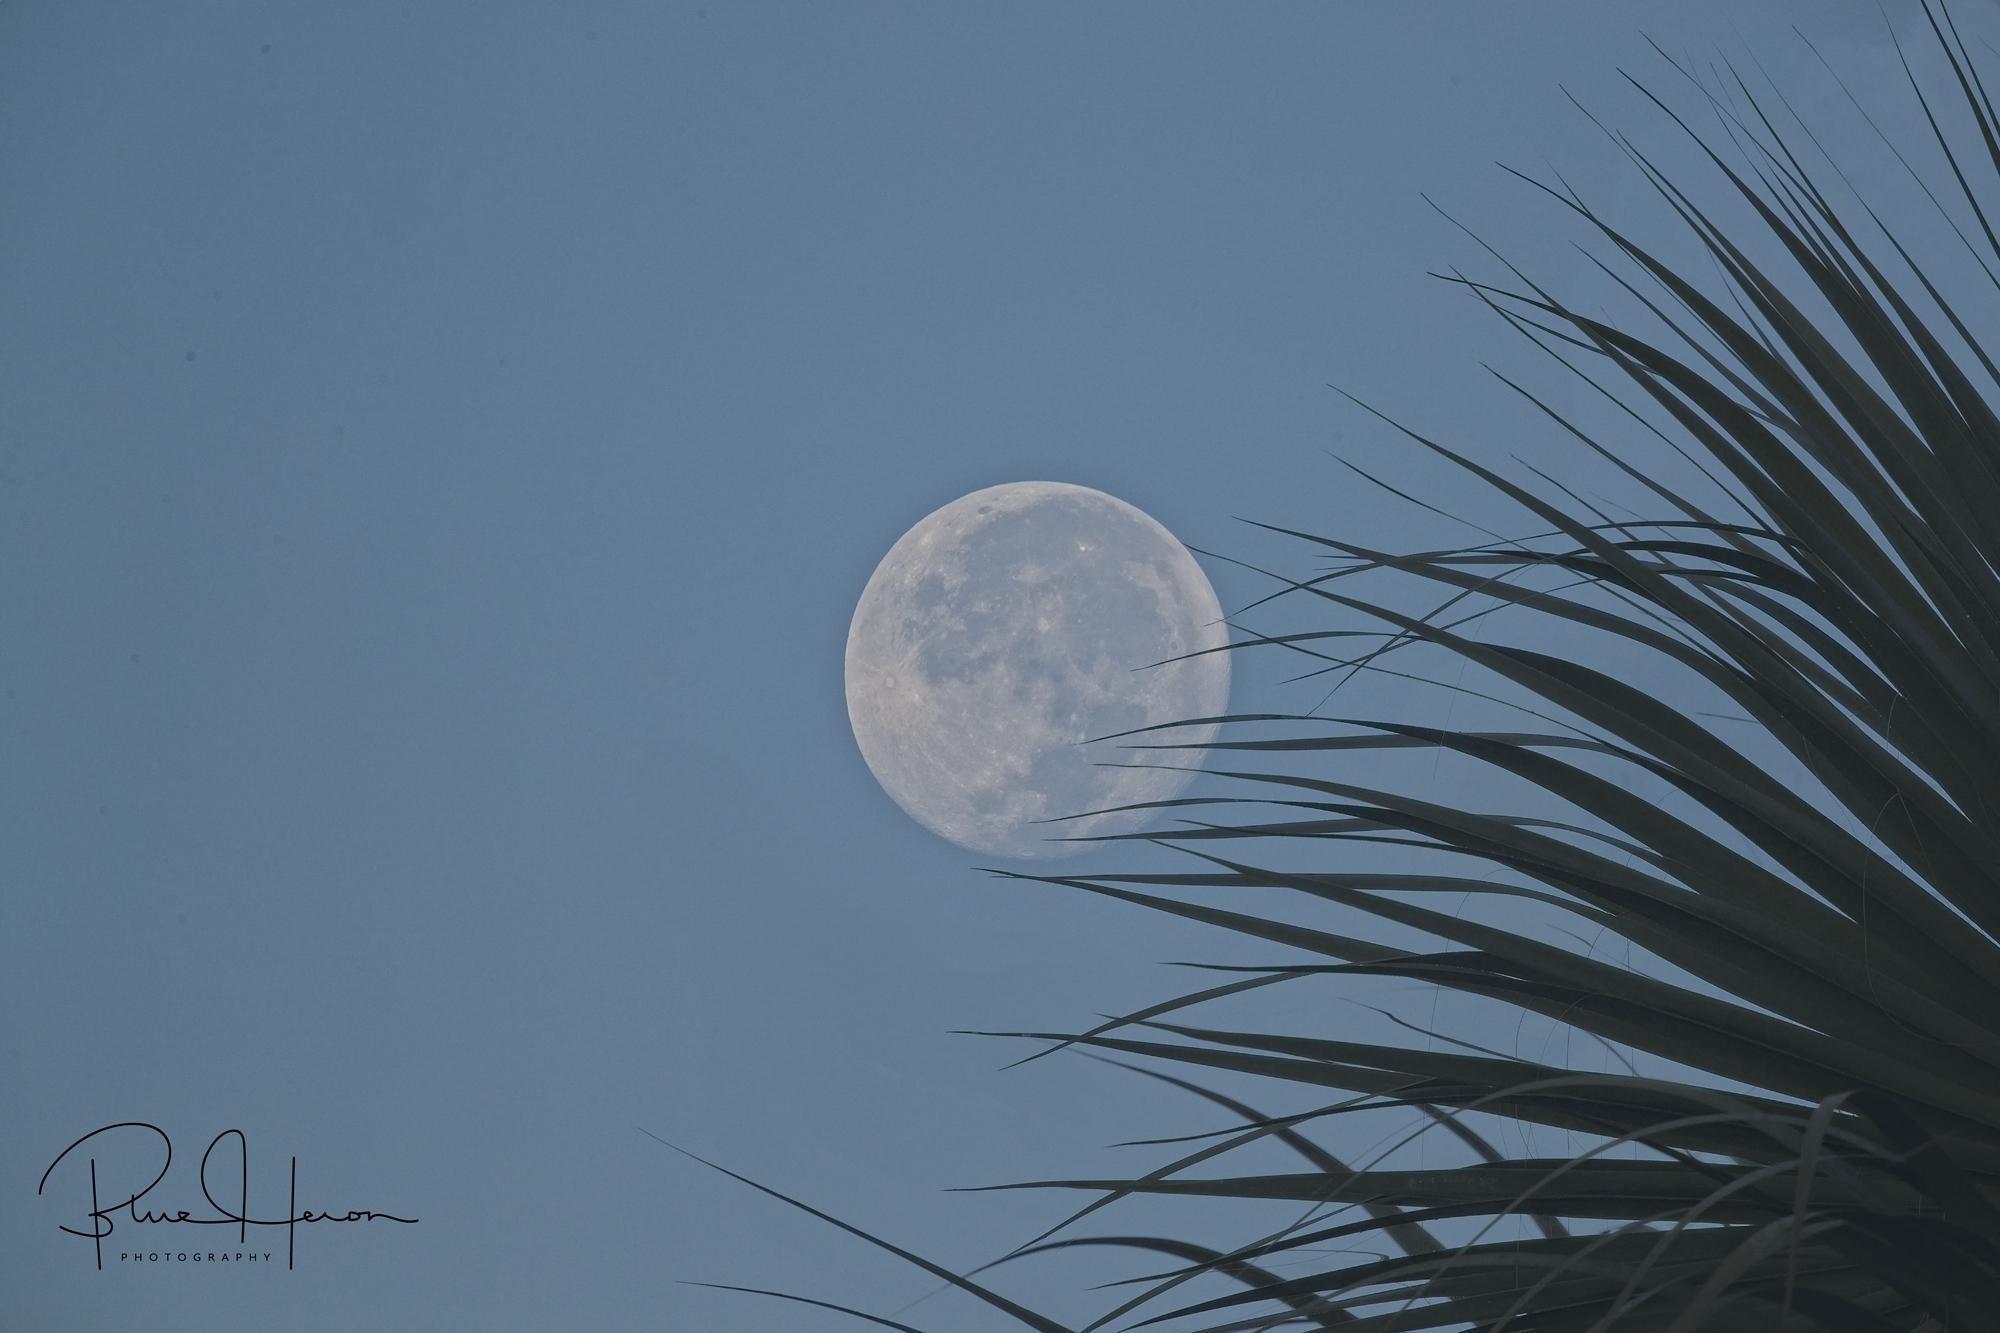 Morning harvest moonset over the Broward